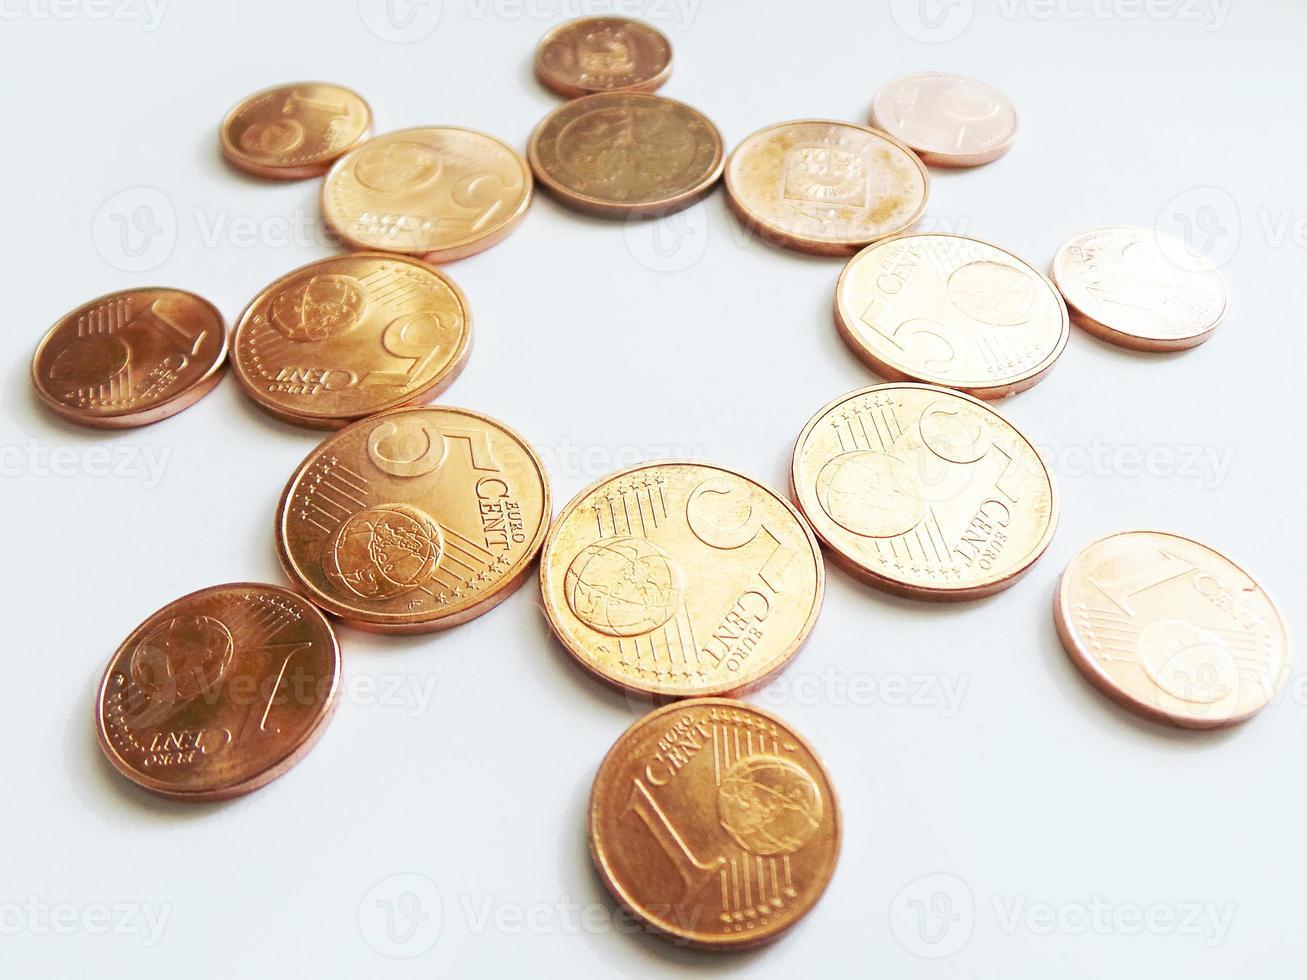 dinero sol - monedas de euro de cobre foto